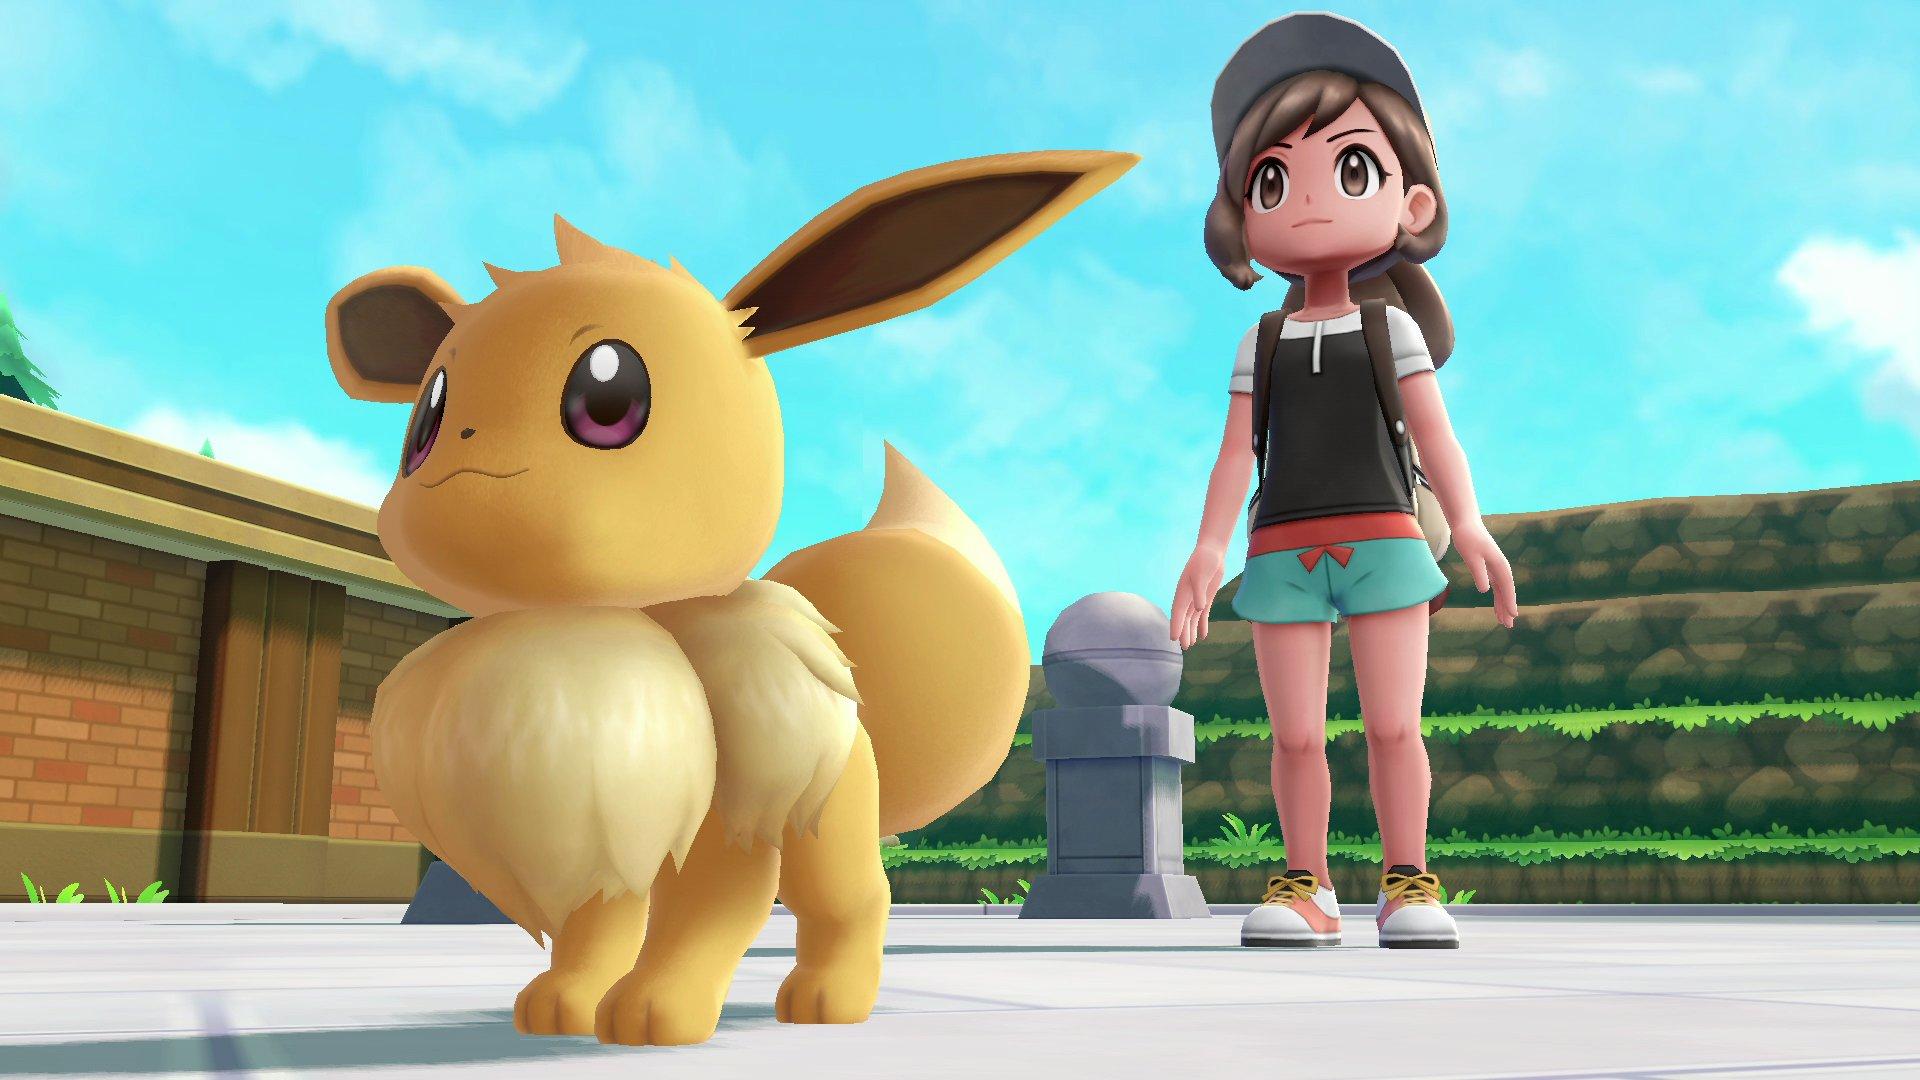 Pokenews Sept 17 Pokemon Let S Go Pikachu Let S Go Eevee